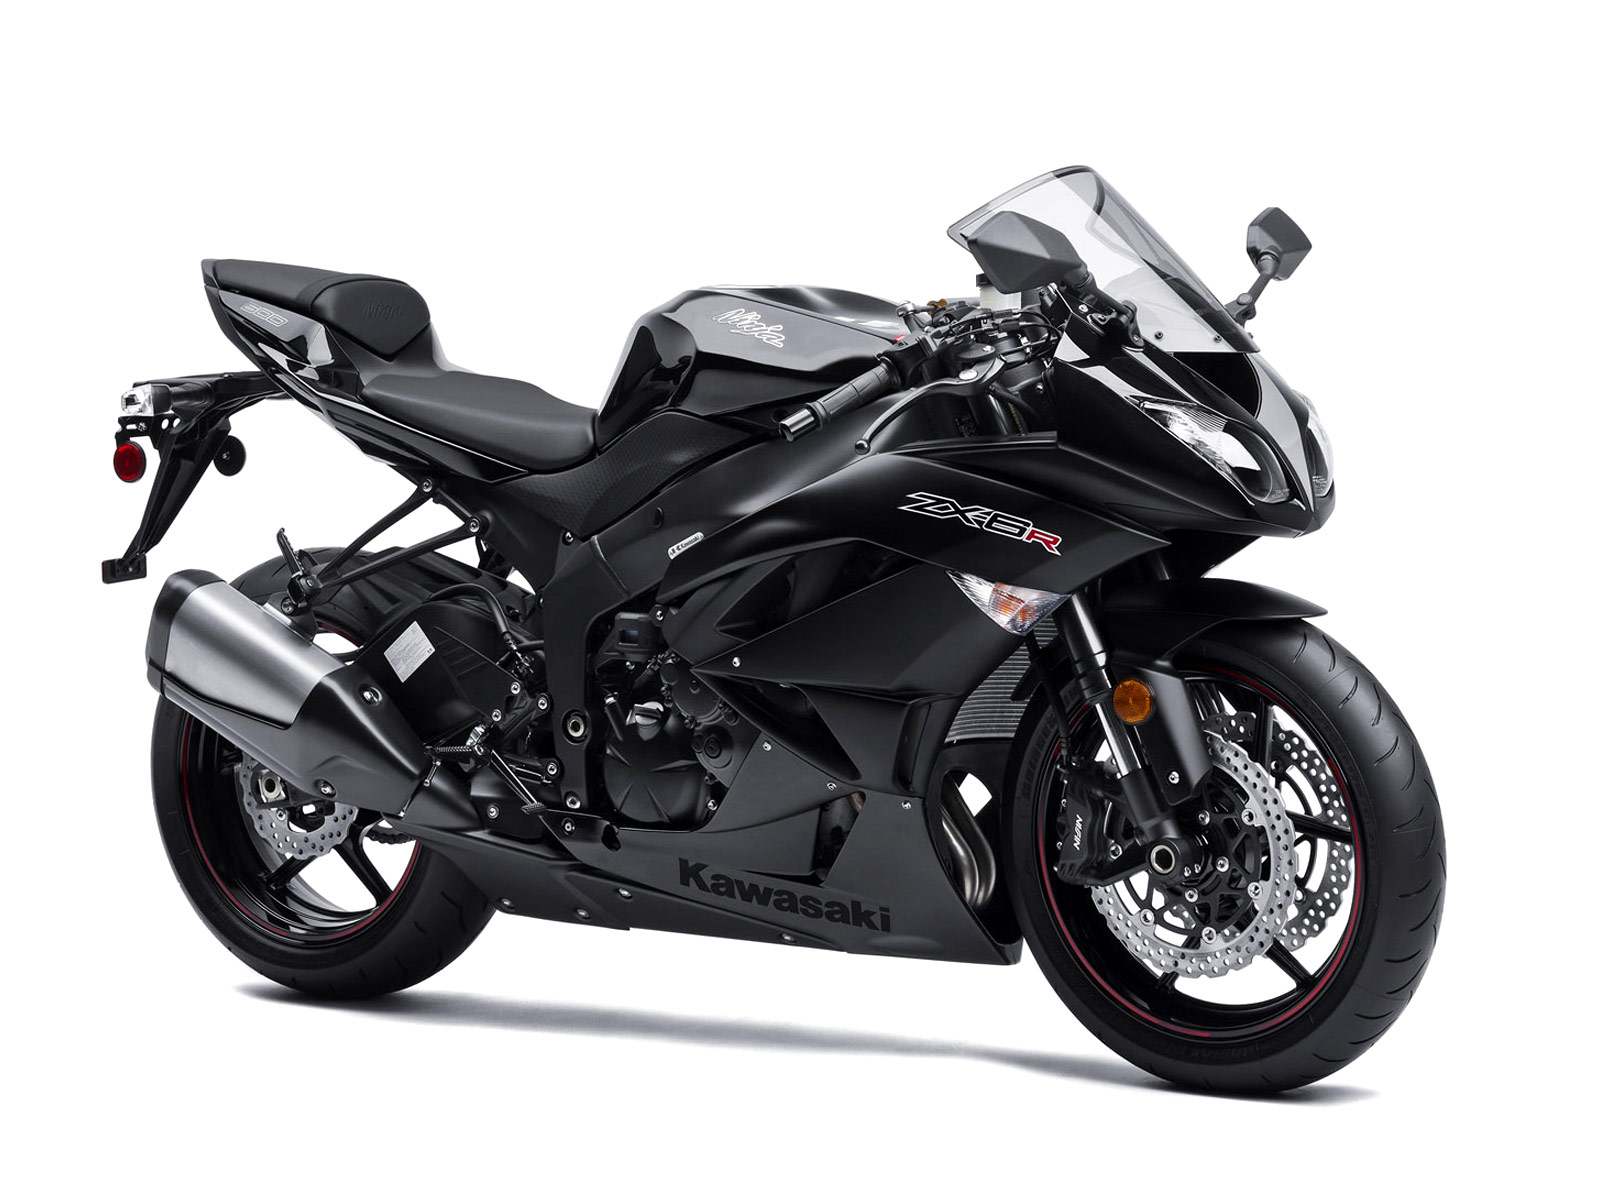 motorcycles 2012 kawasaki ninja zx 6r motorcycle desktop. Black Bedroom Furniture Sets. Home Design Ideas